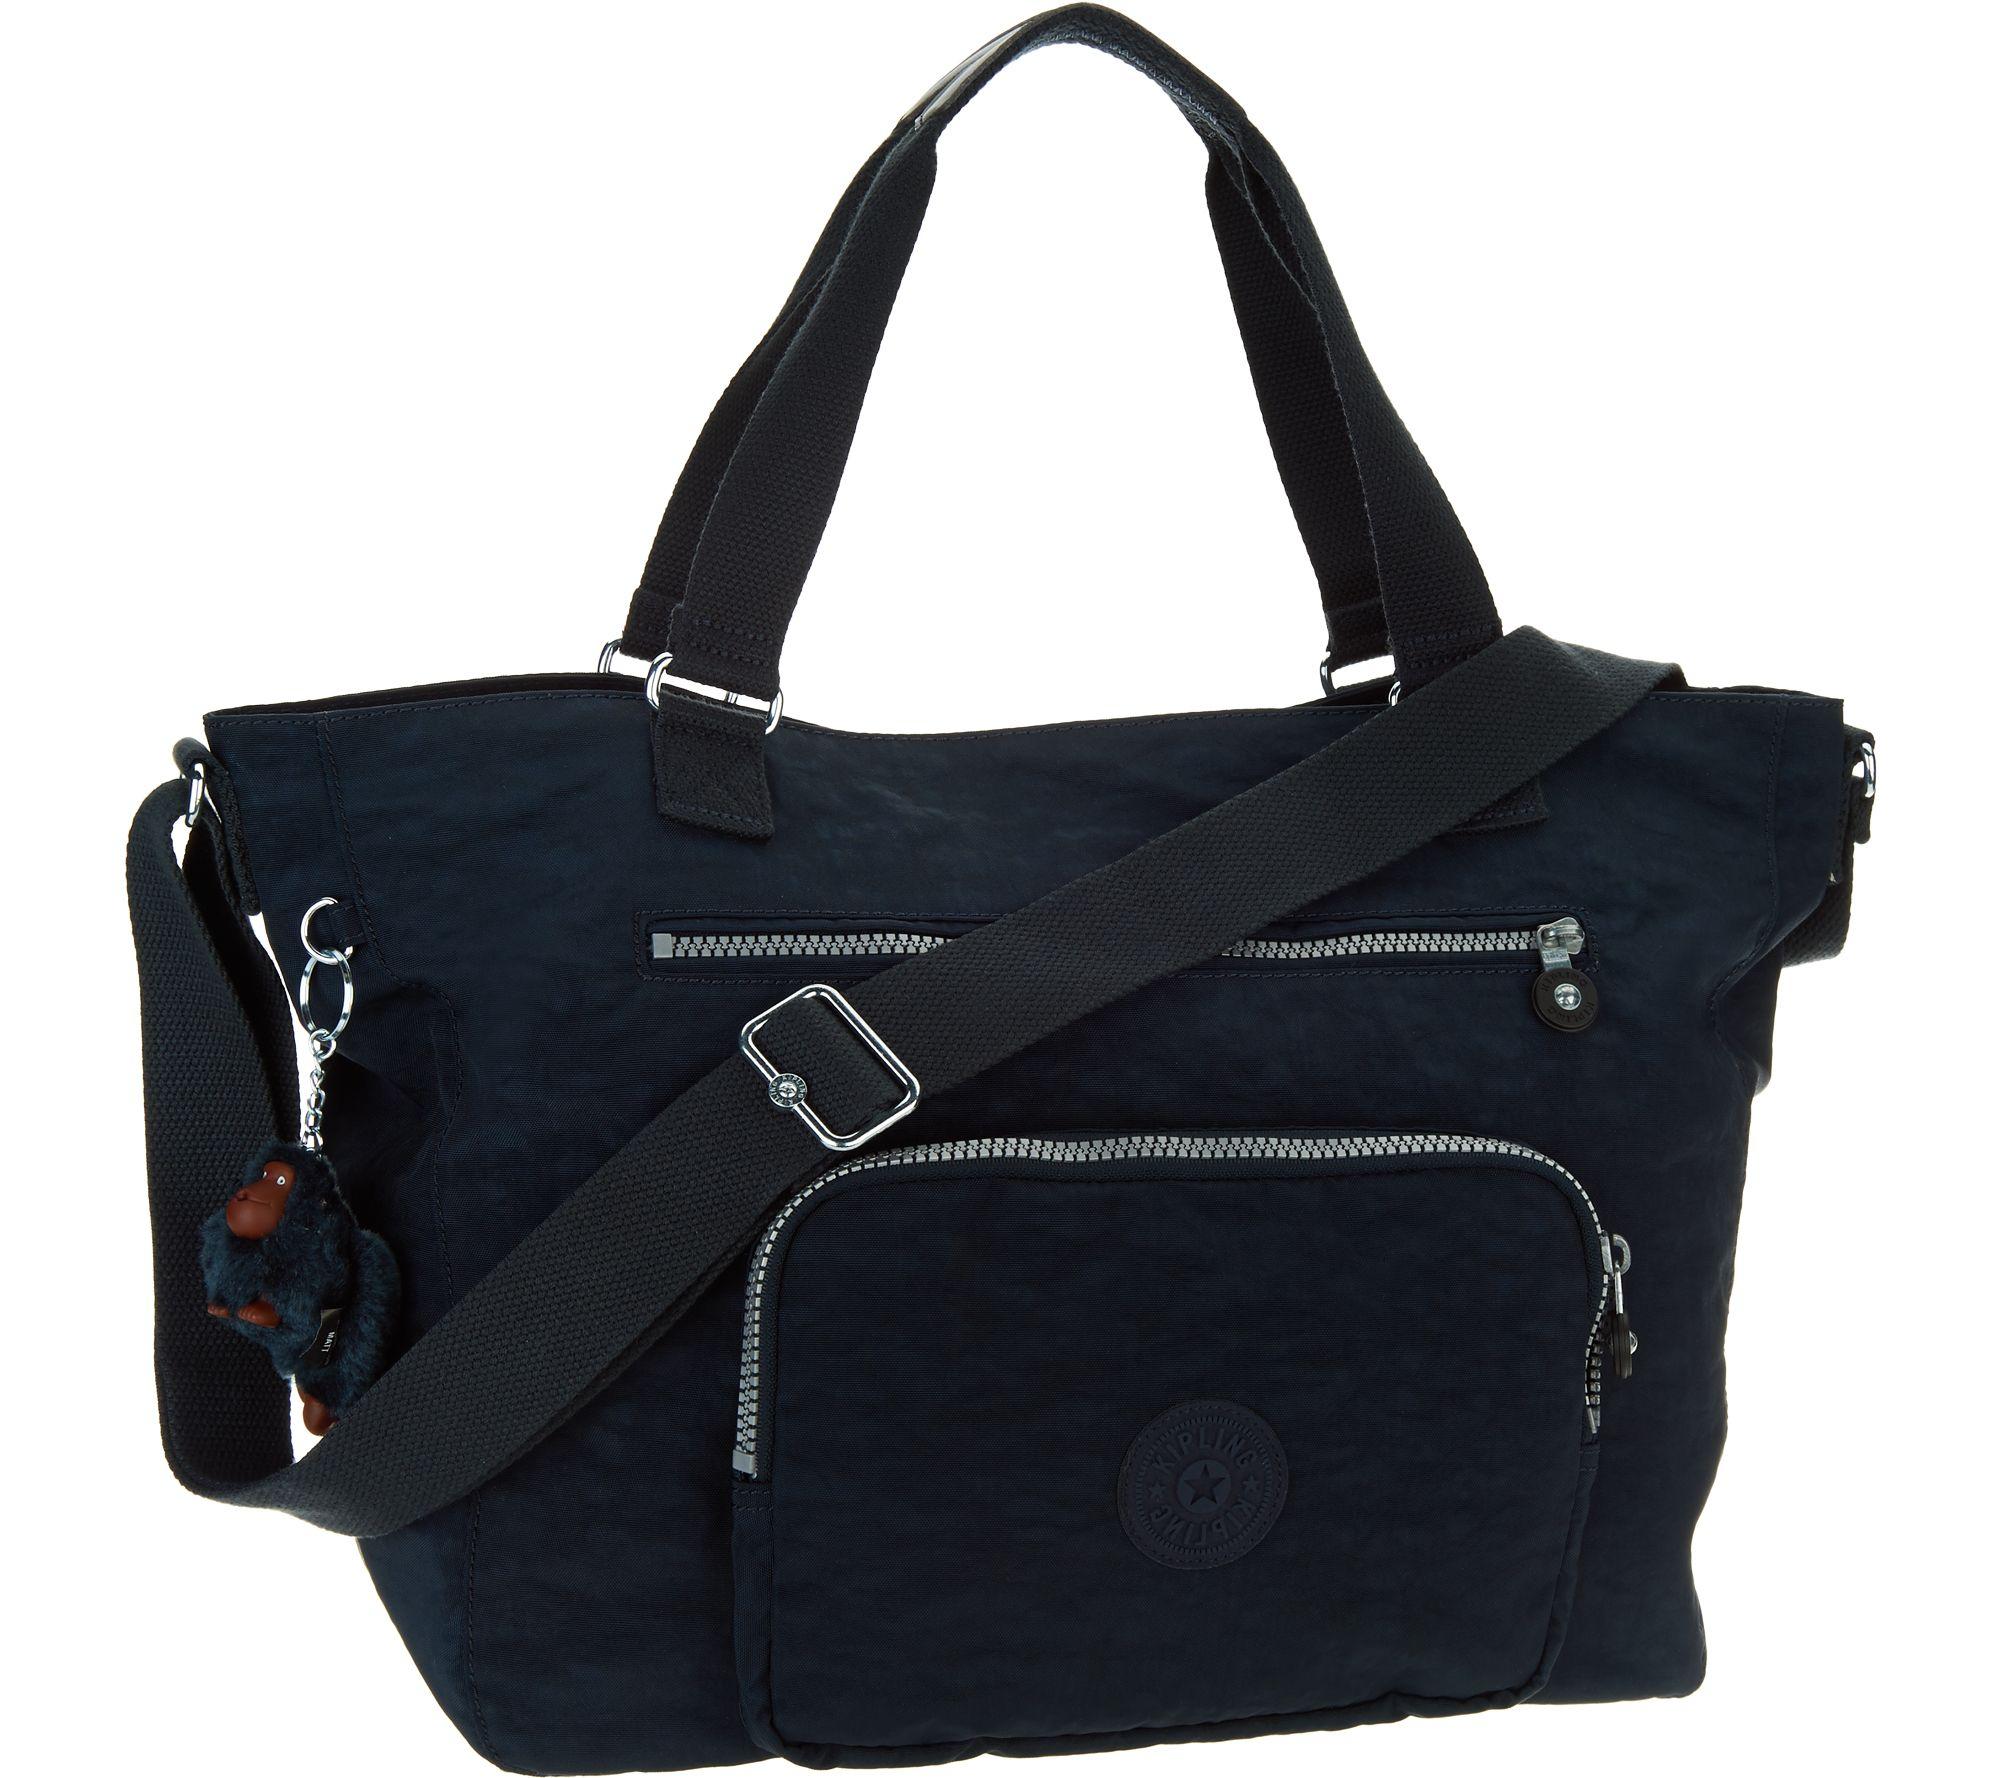 272740afdd3 Kipling Convertible Tote Bag - Maxwell - Page 1 — QVC.com